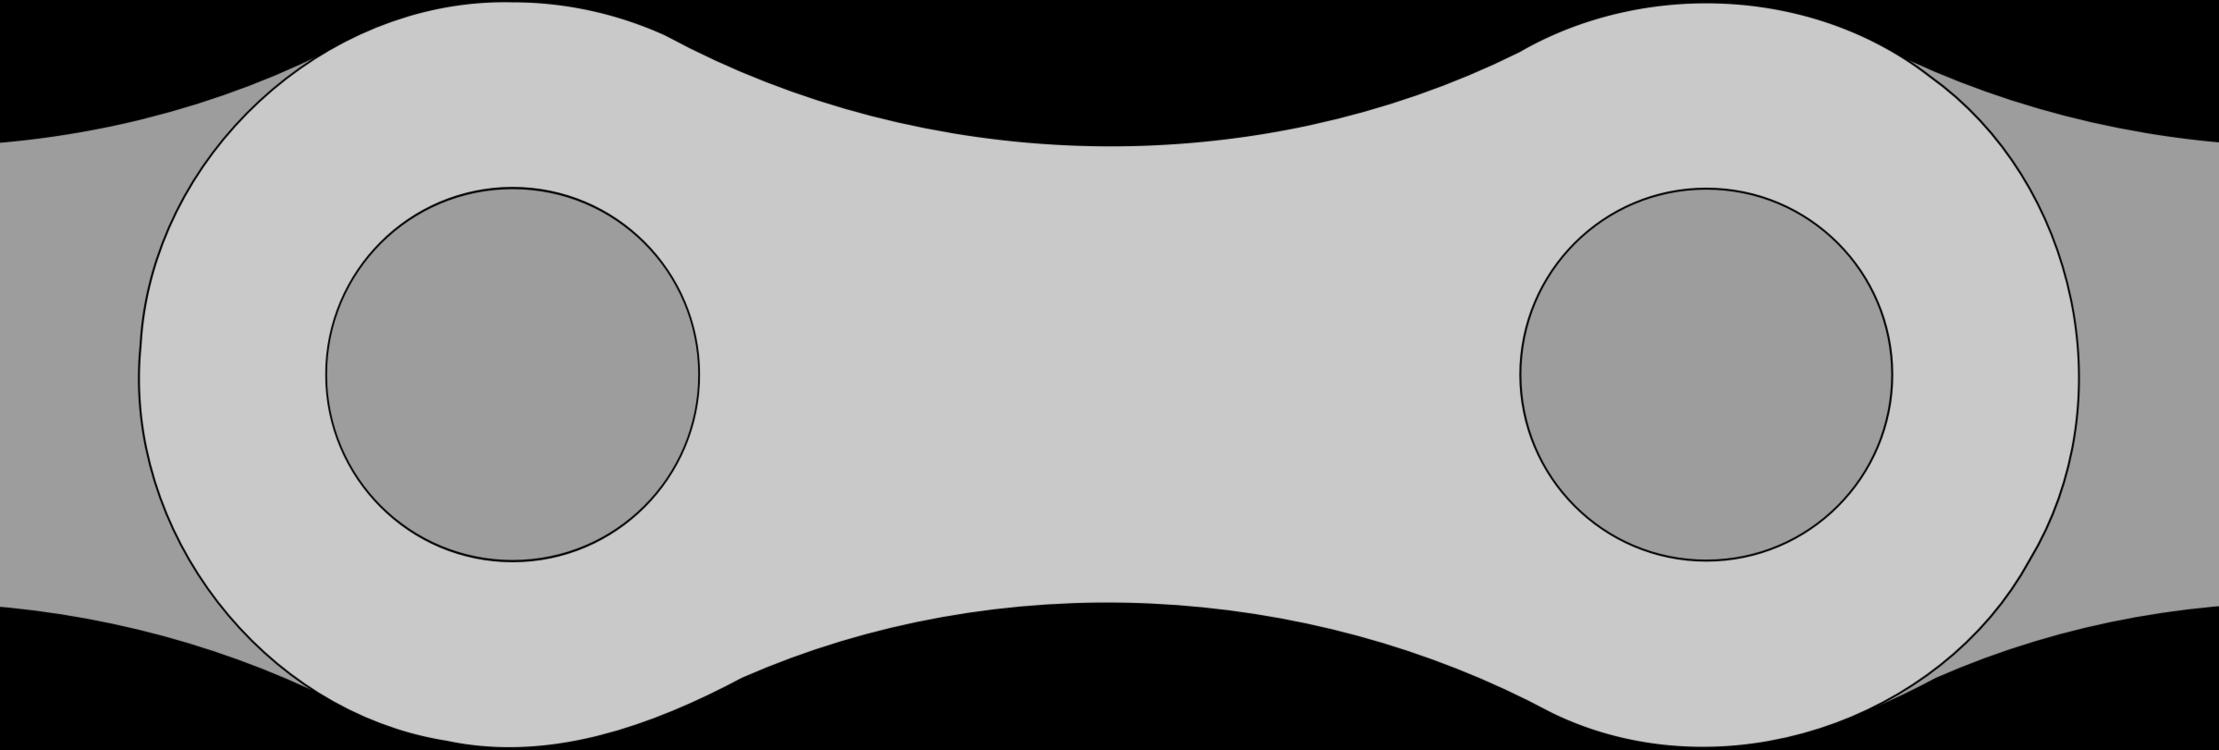 Angle,Rectangle,Head